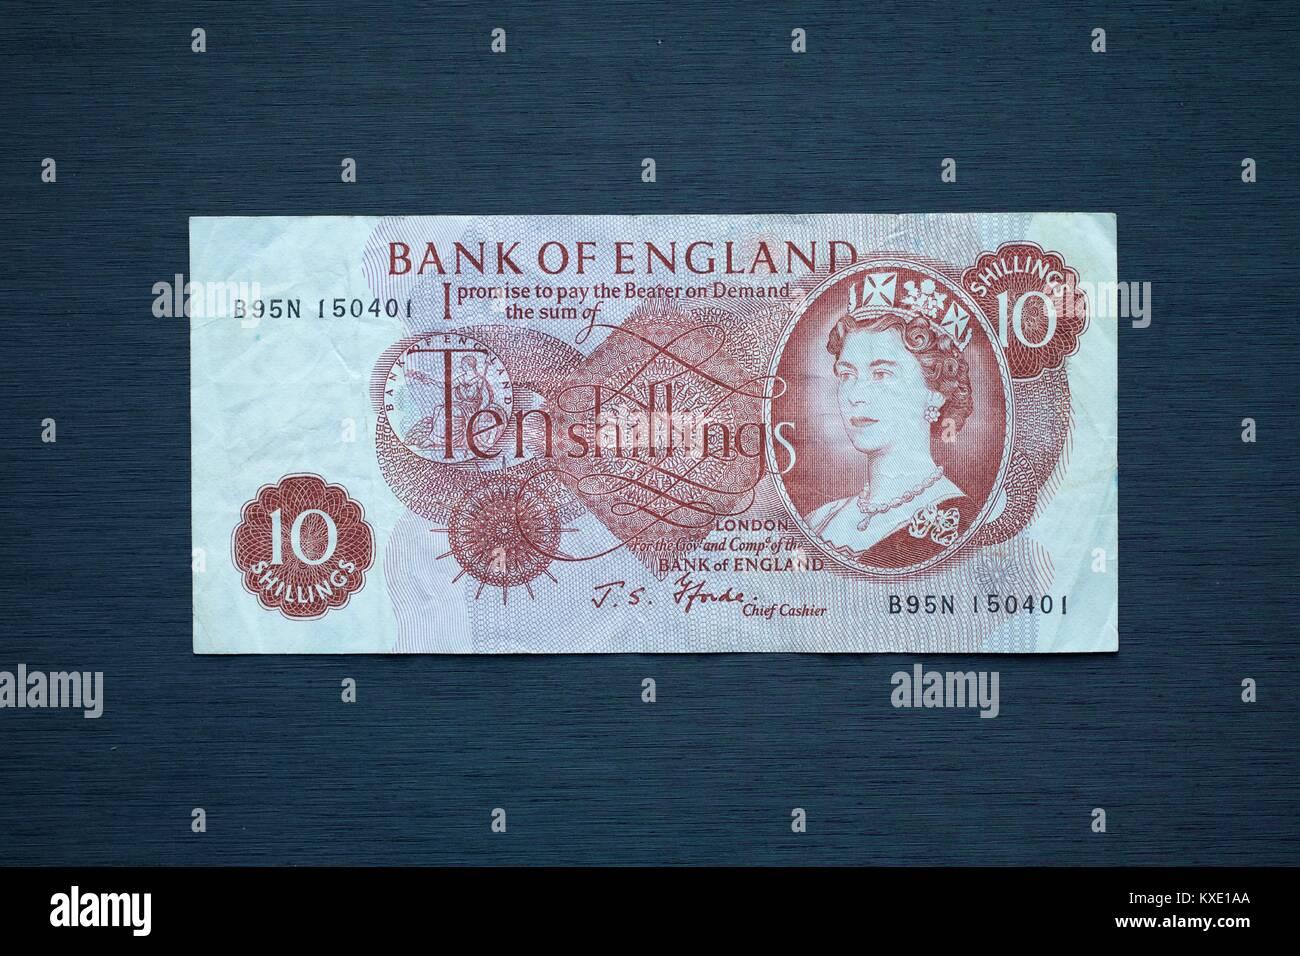 Bank of England 10 Shilling Banknote - Stock Image